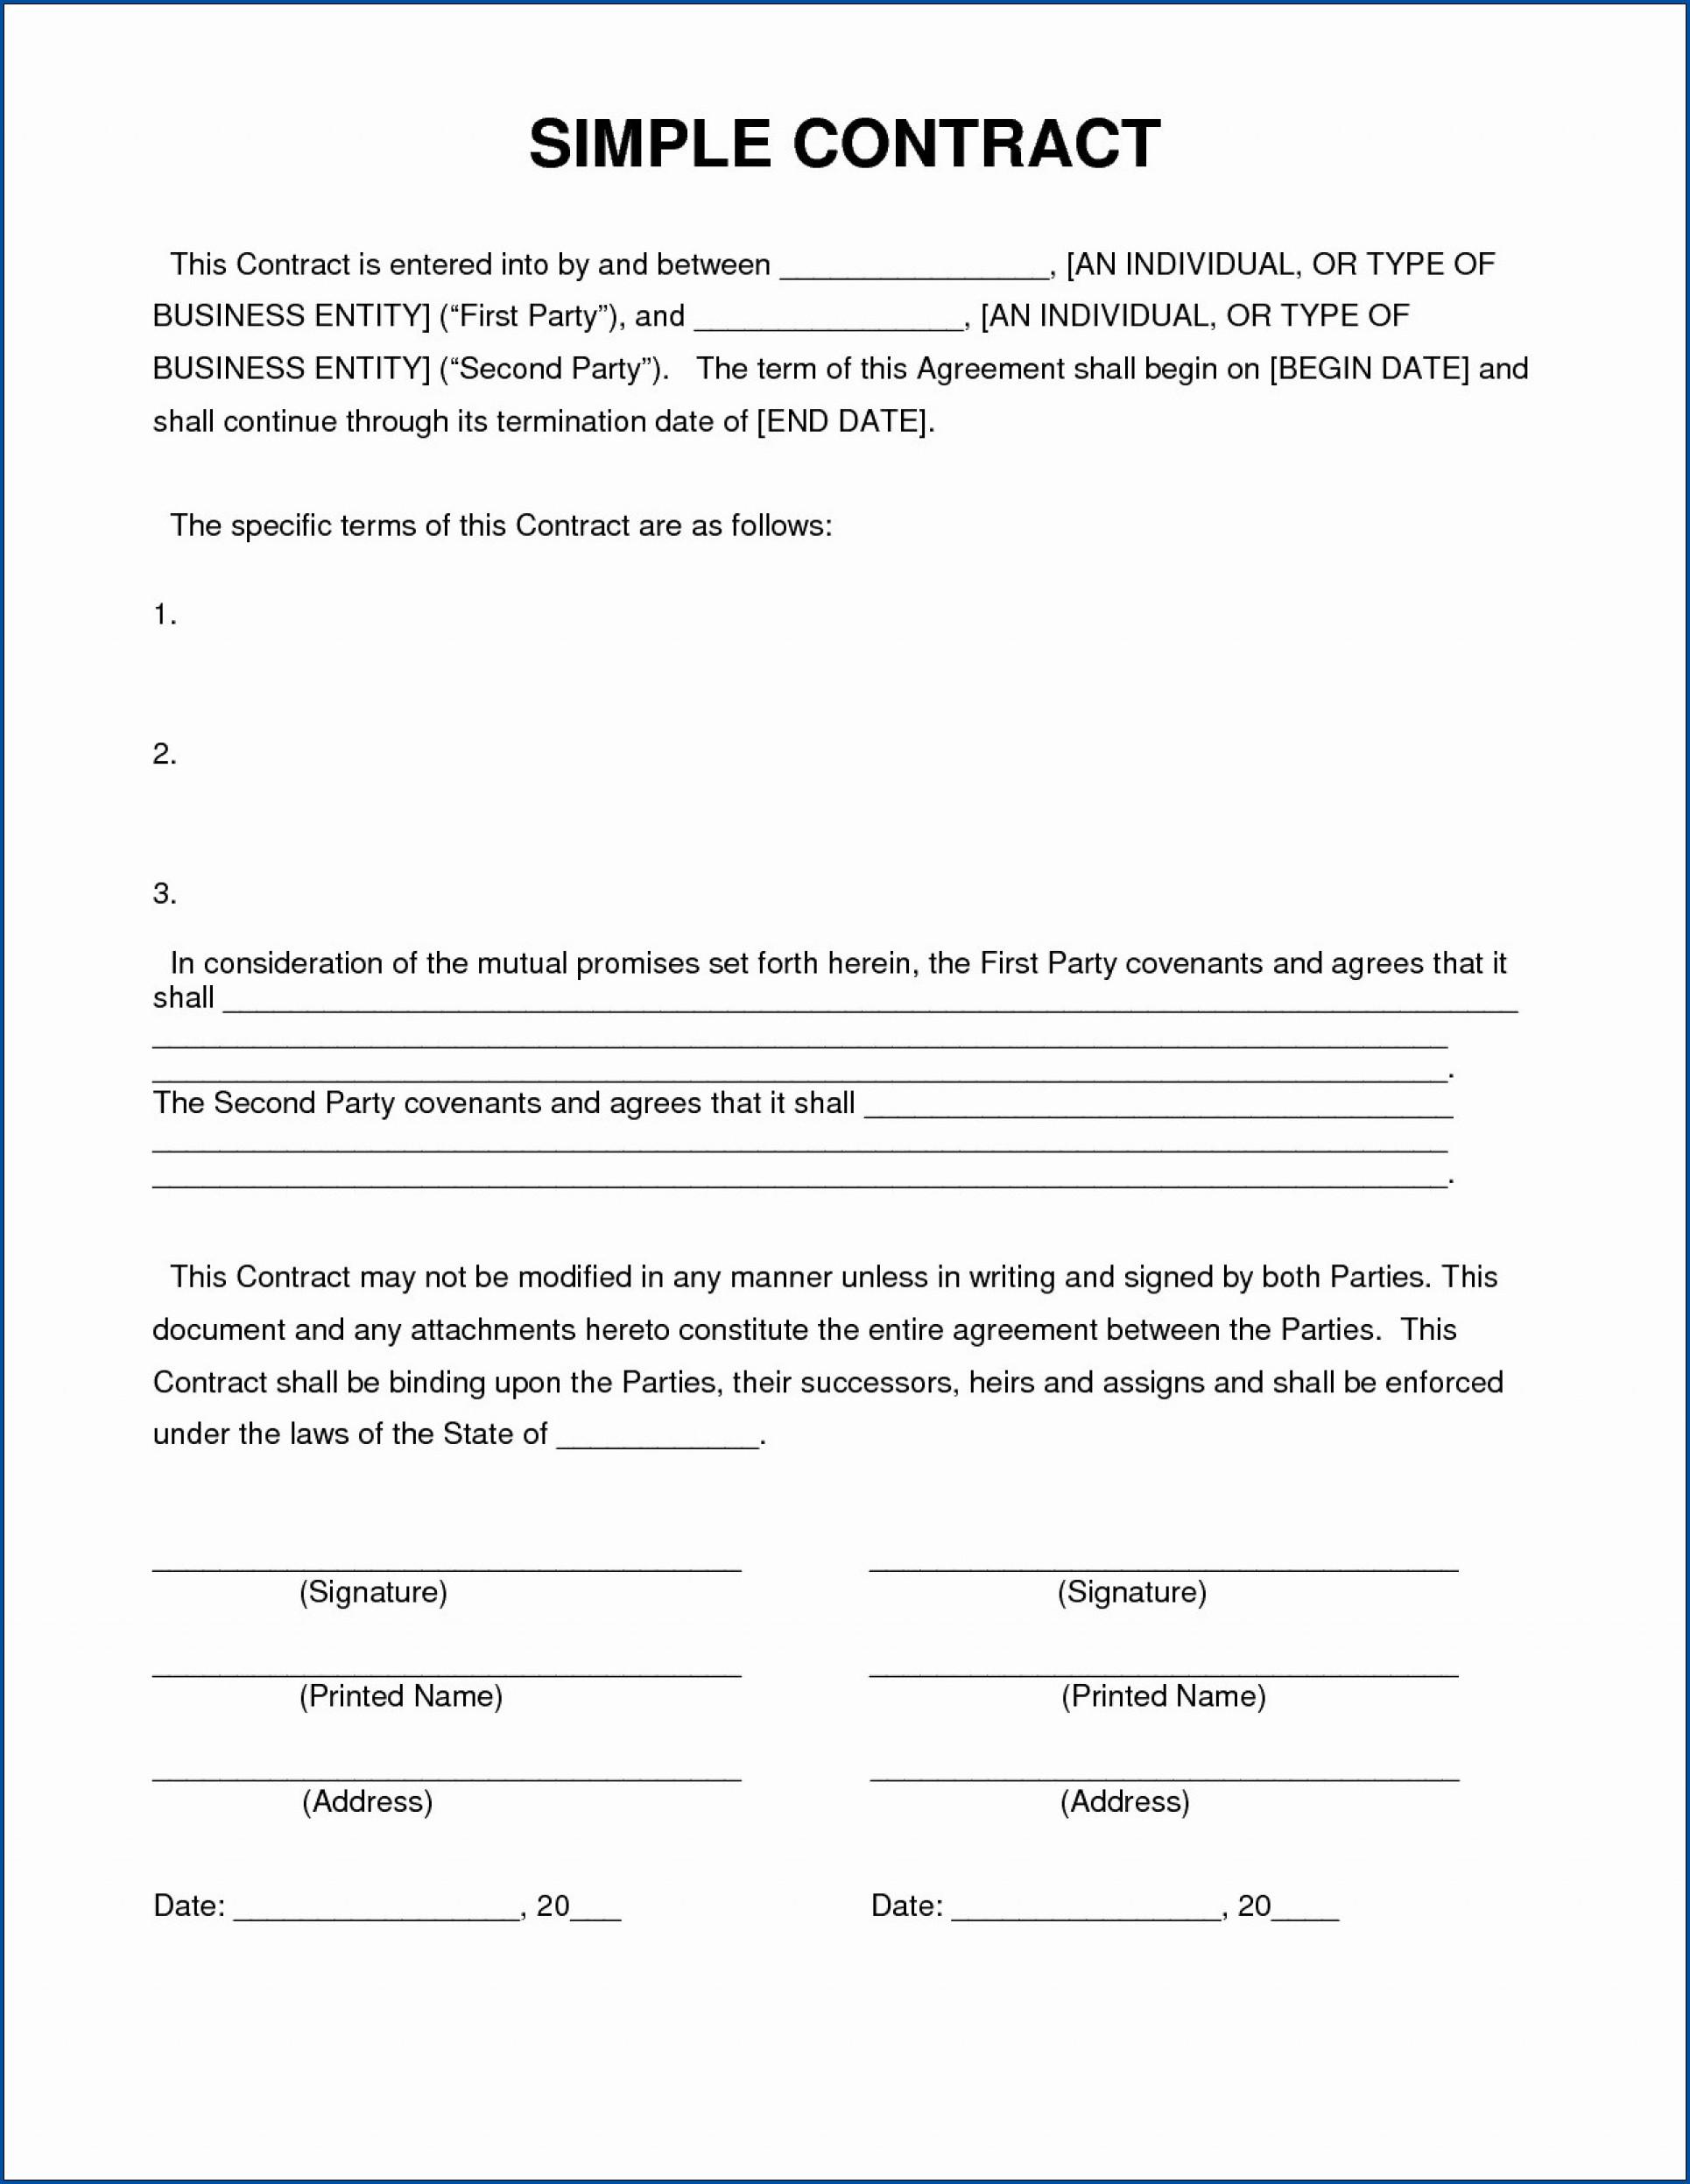 Example of Loan Contract Between Friends